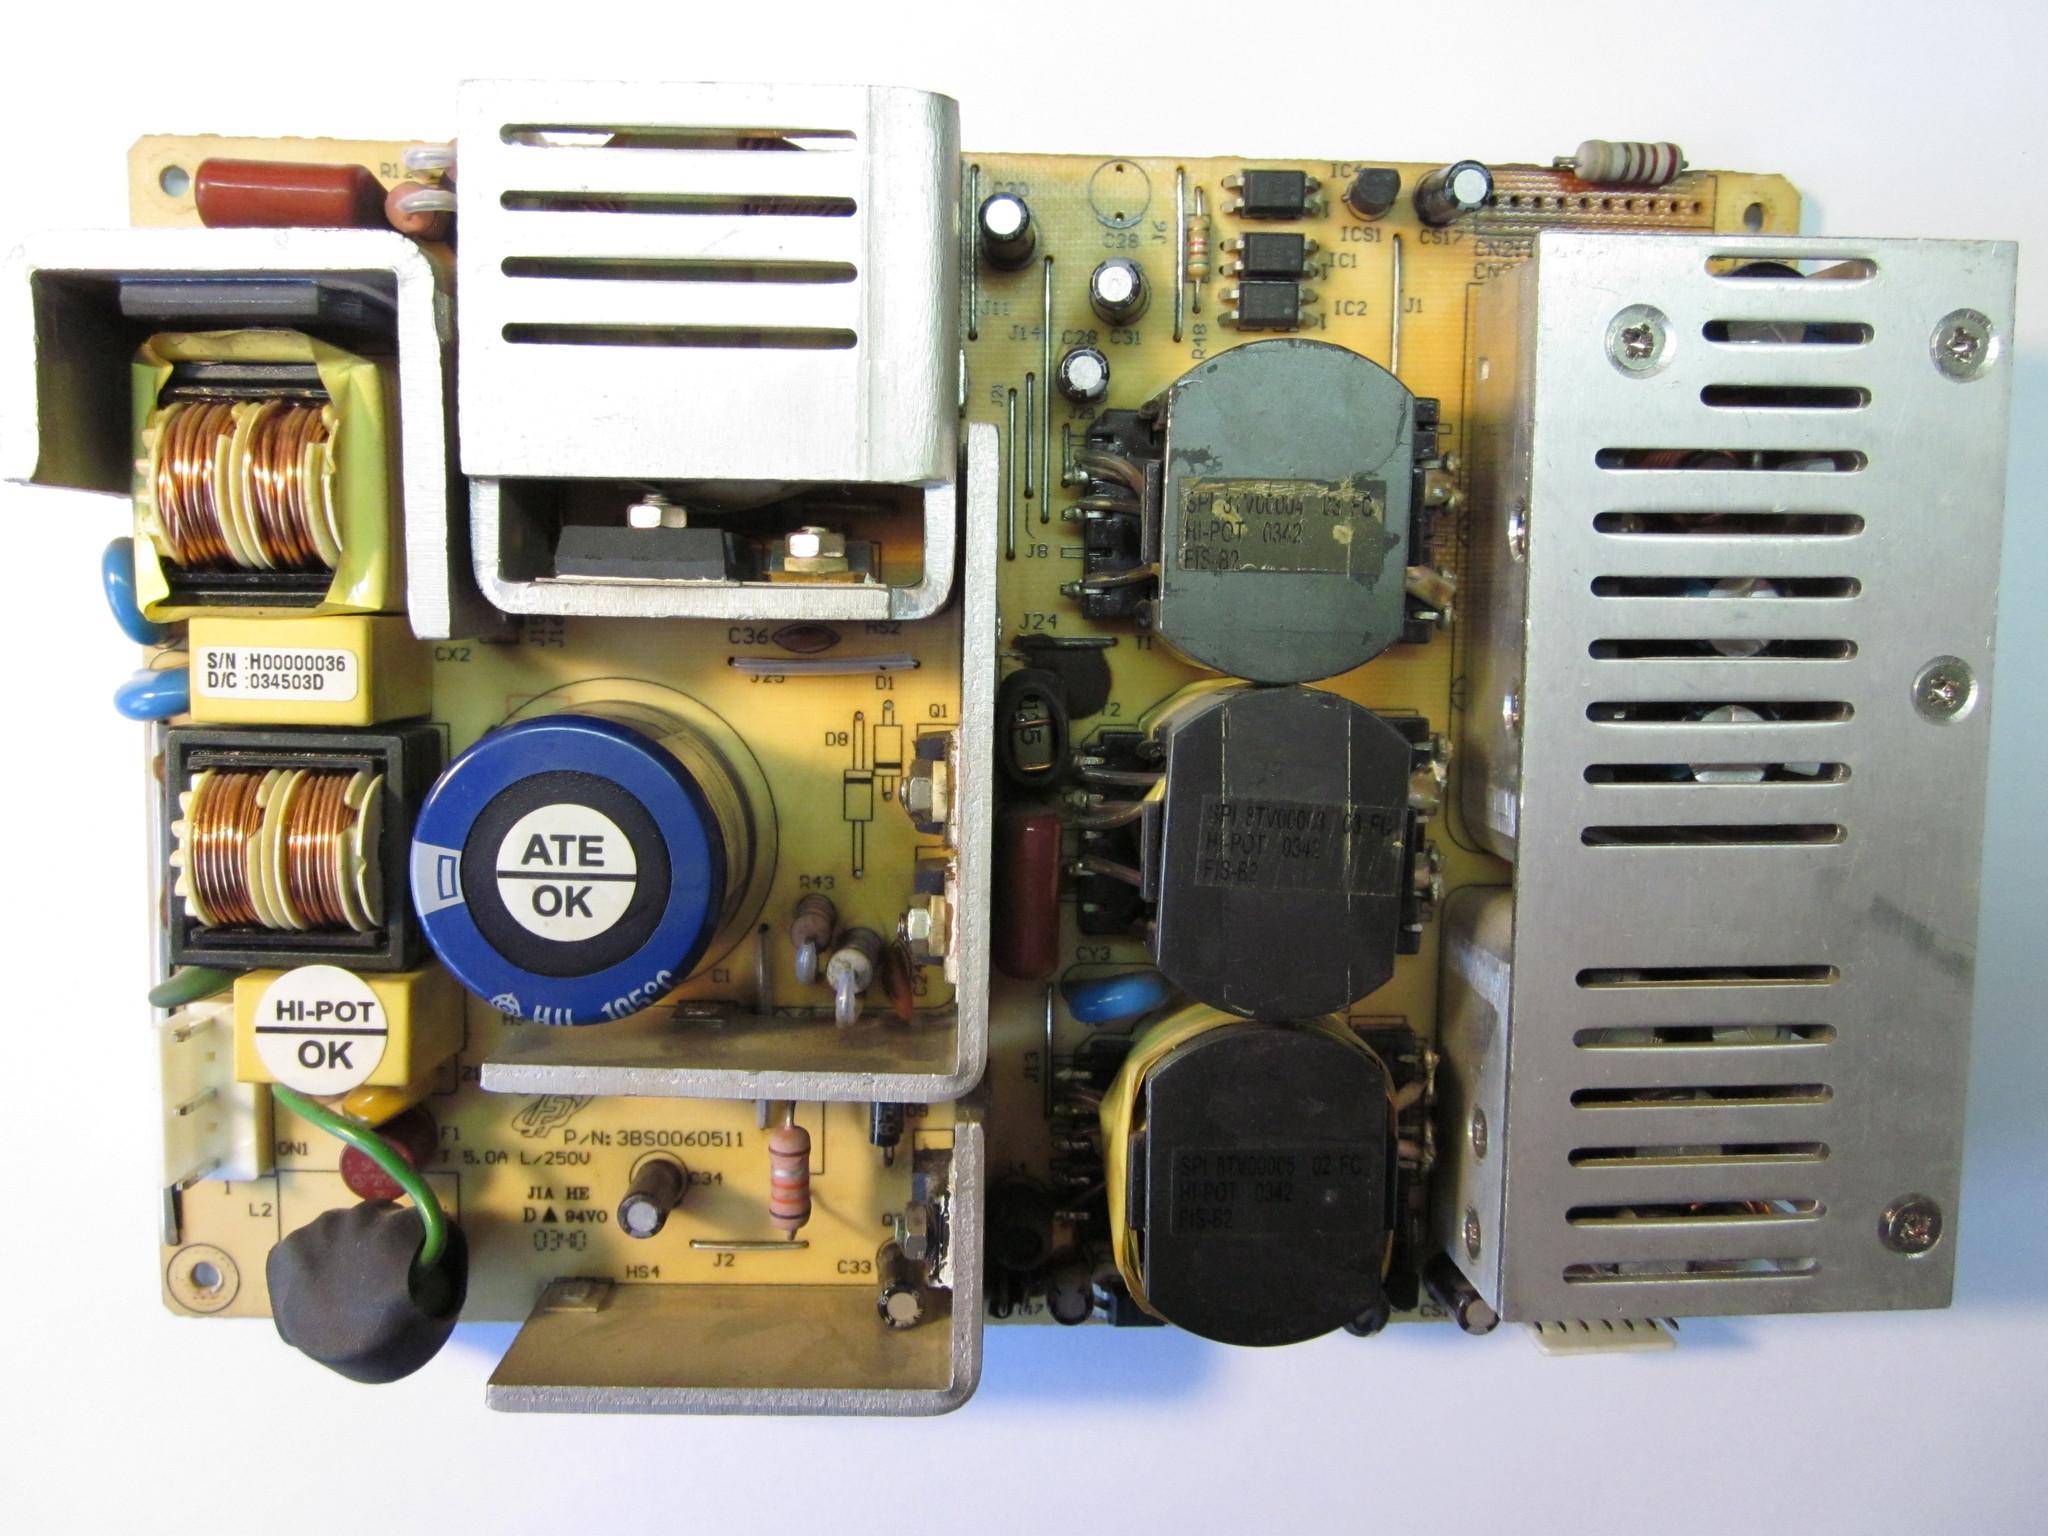 FSP180-2M01 REV:1